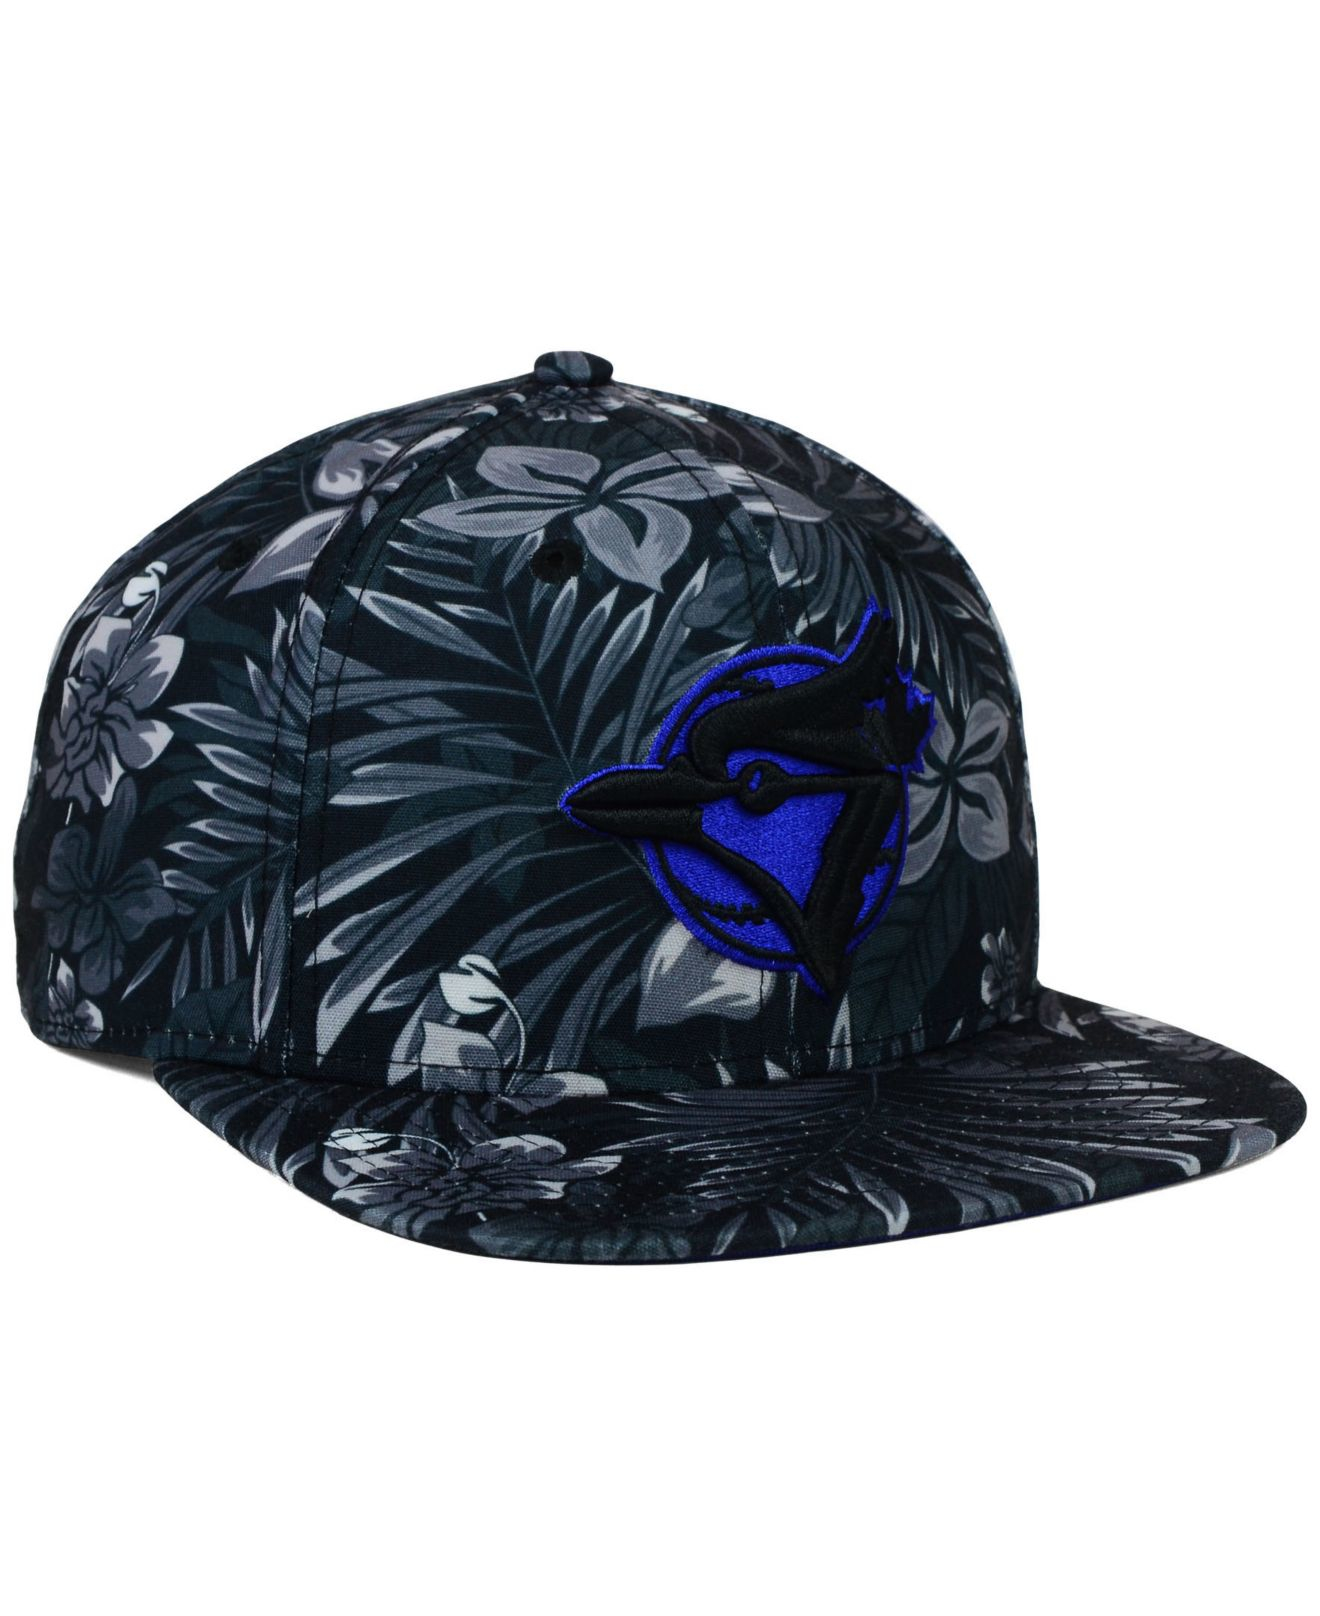 408d734bd19 Lyst - KTZ Toronto Blue Jays Night Tropic 9fifty Snapback Cap in ...